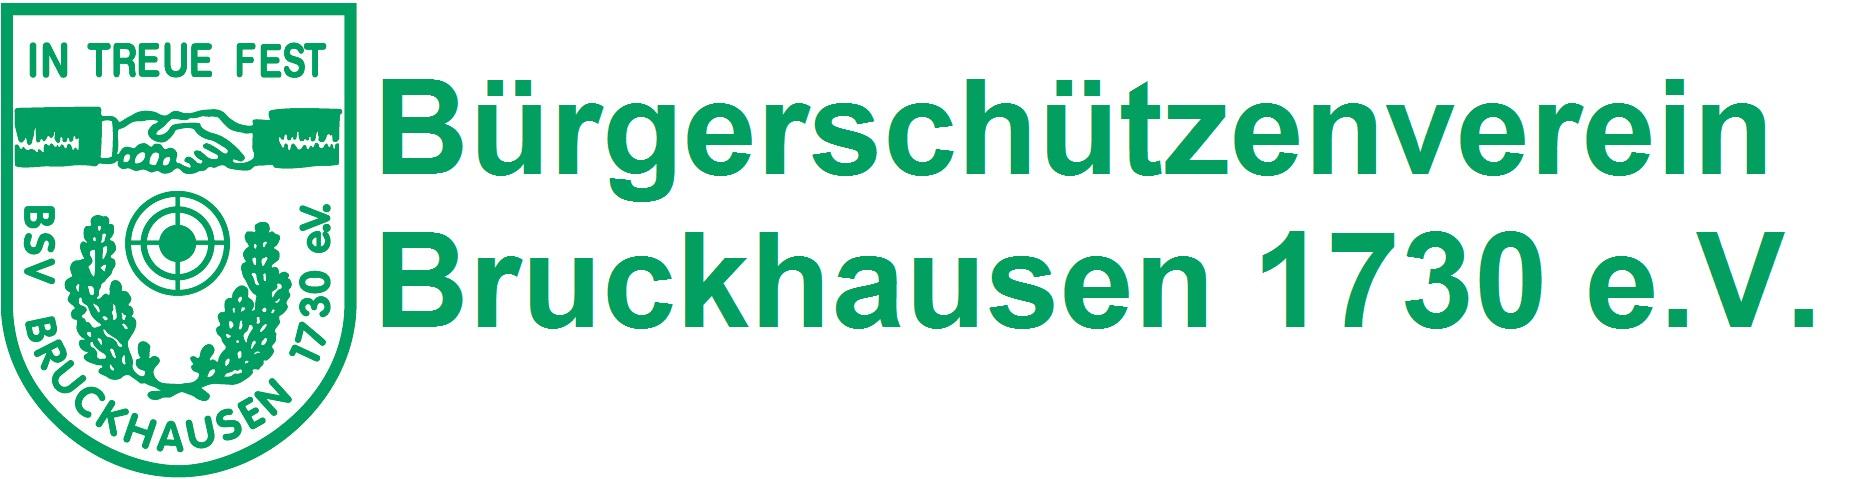 BSV Bruckhausen 1730 eV